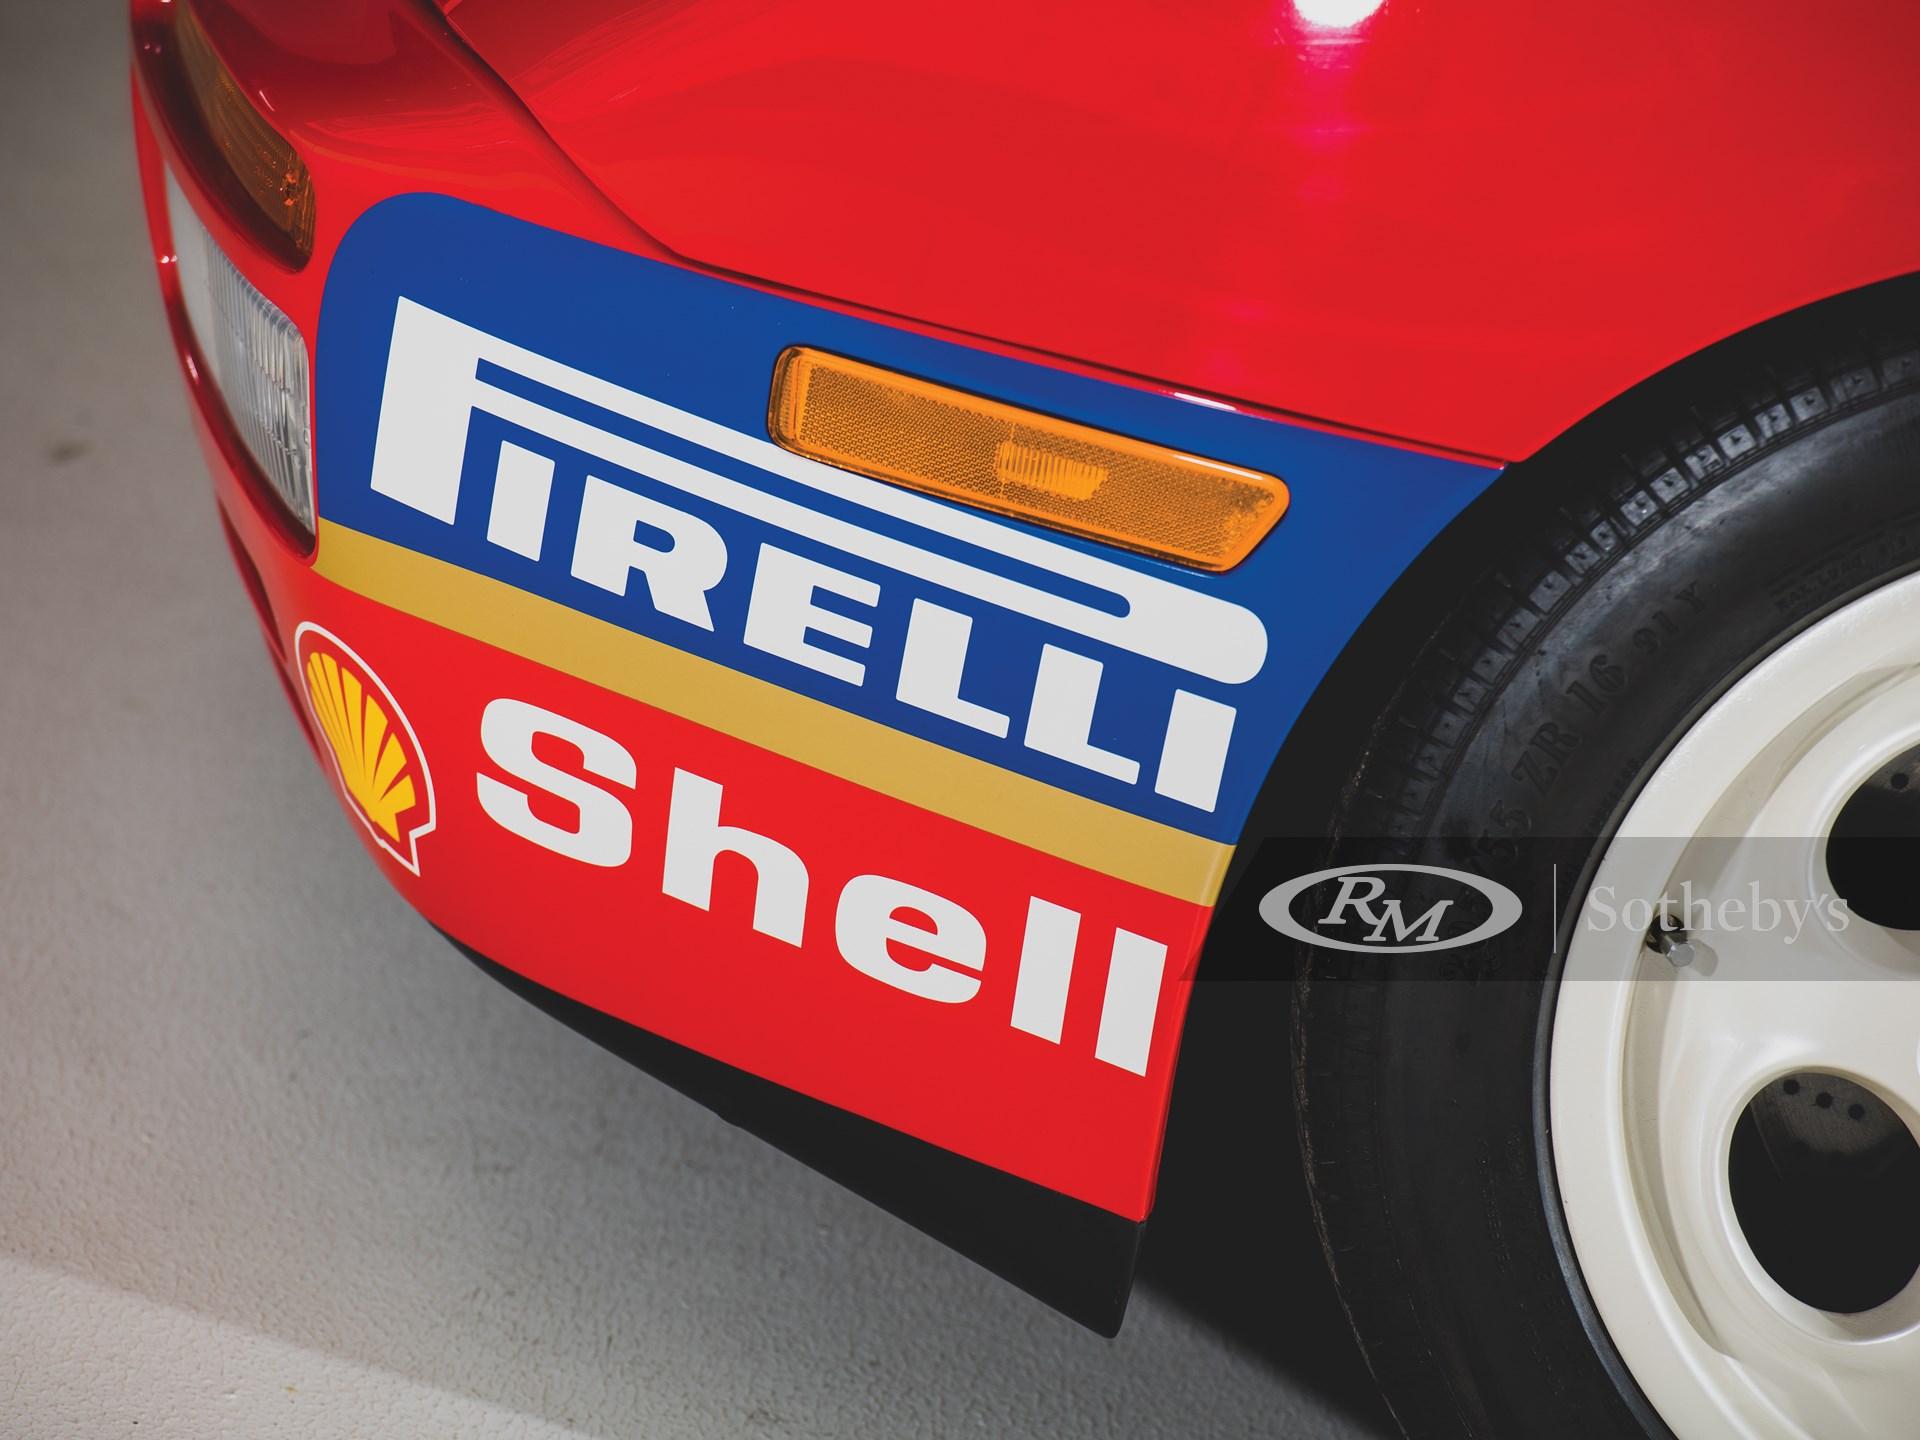 1988 Porsche Rothmans 944 Turbo Cup  -